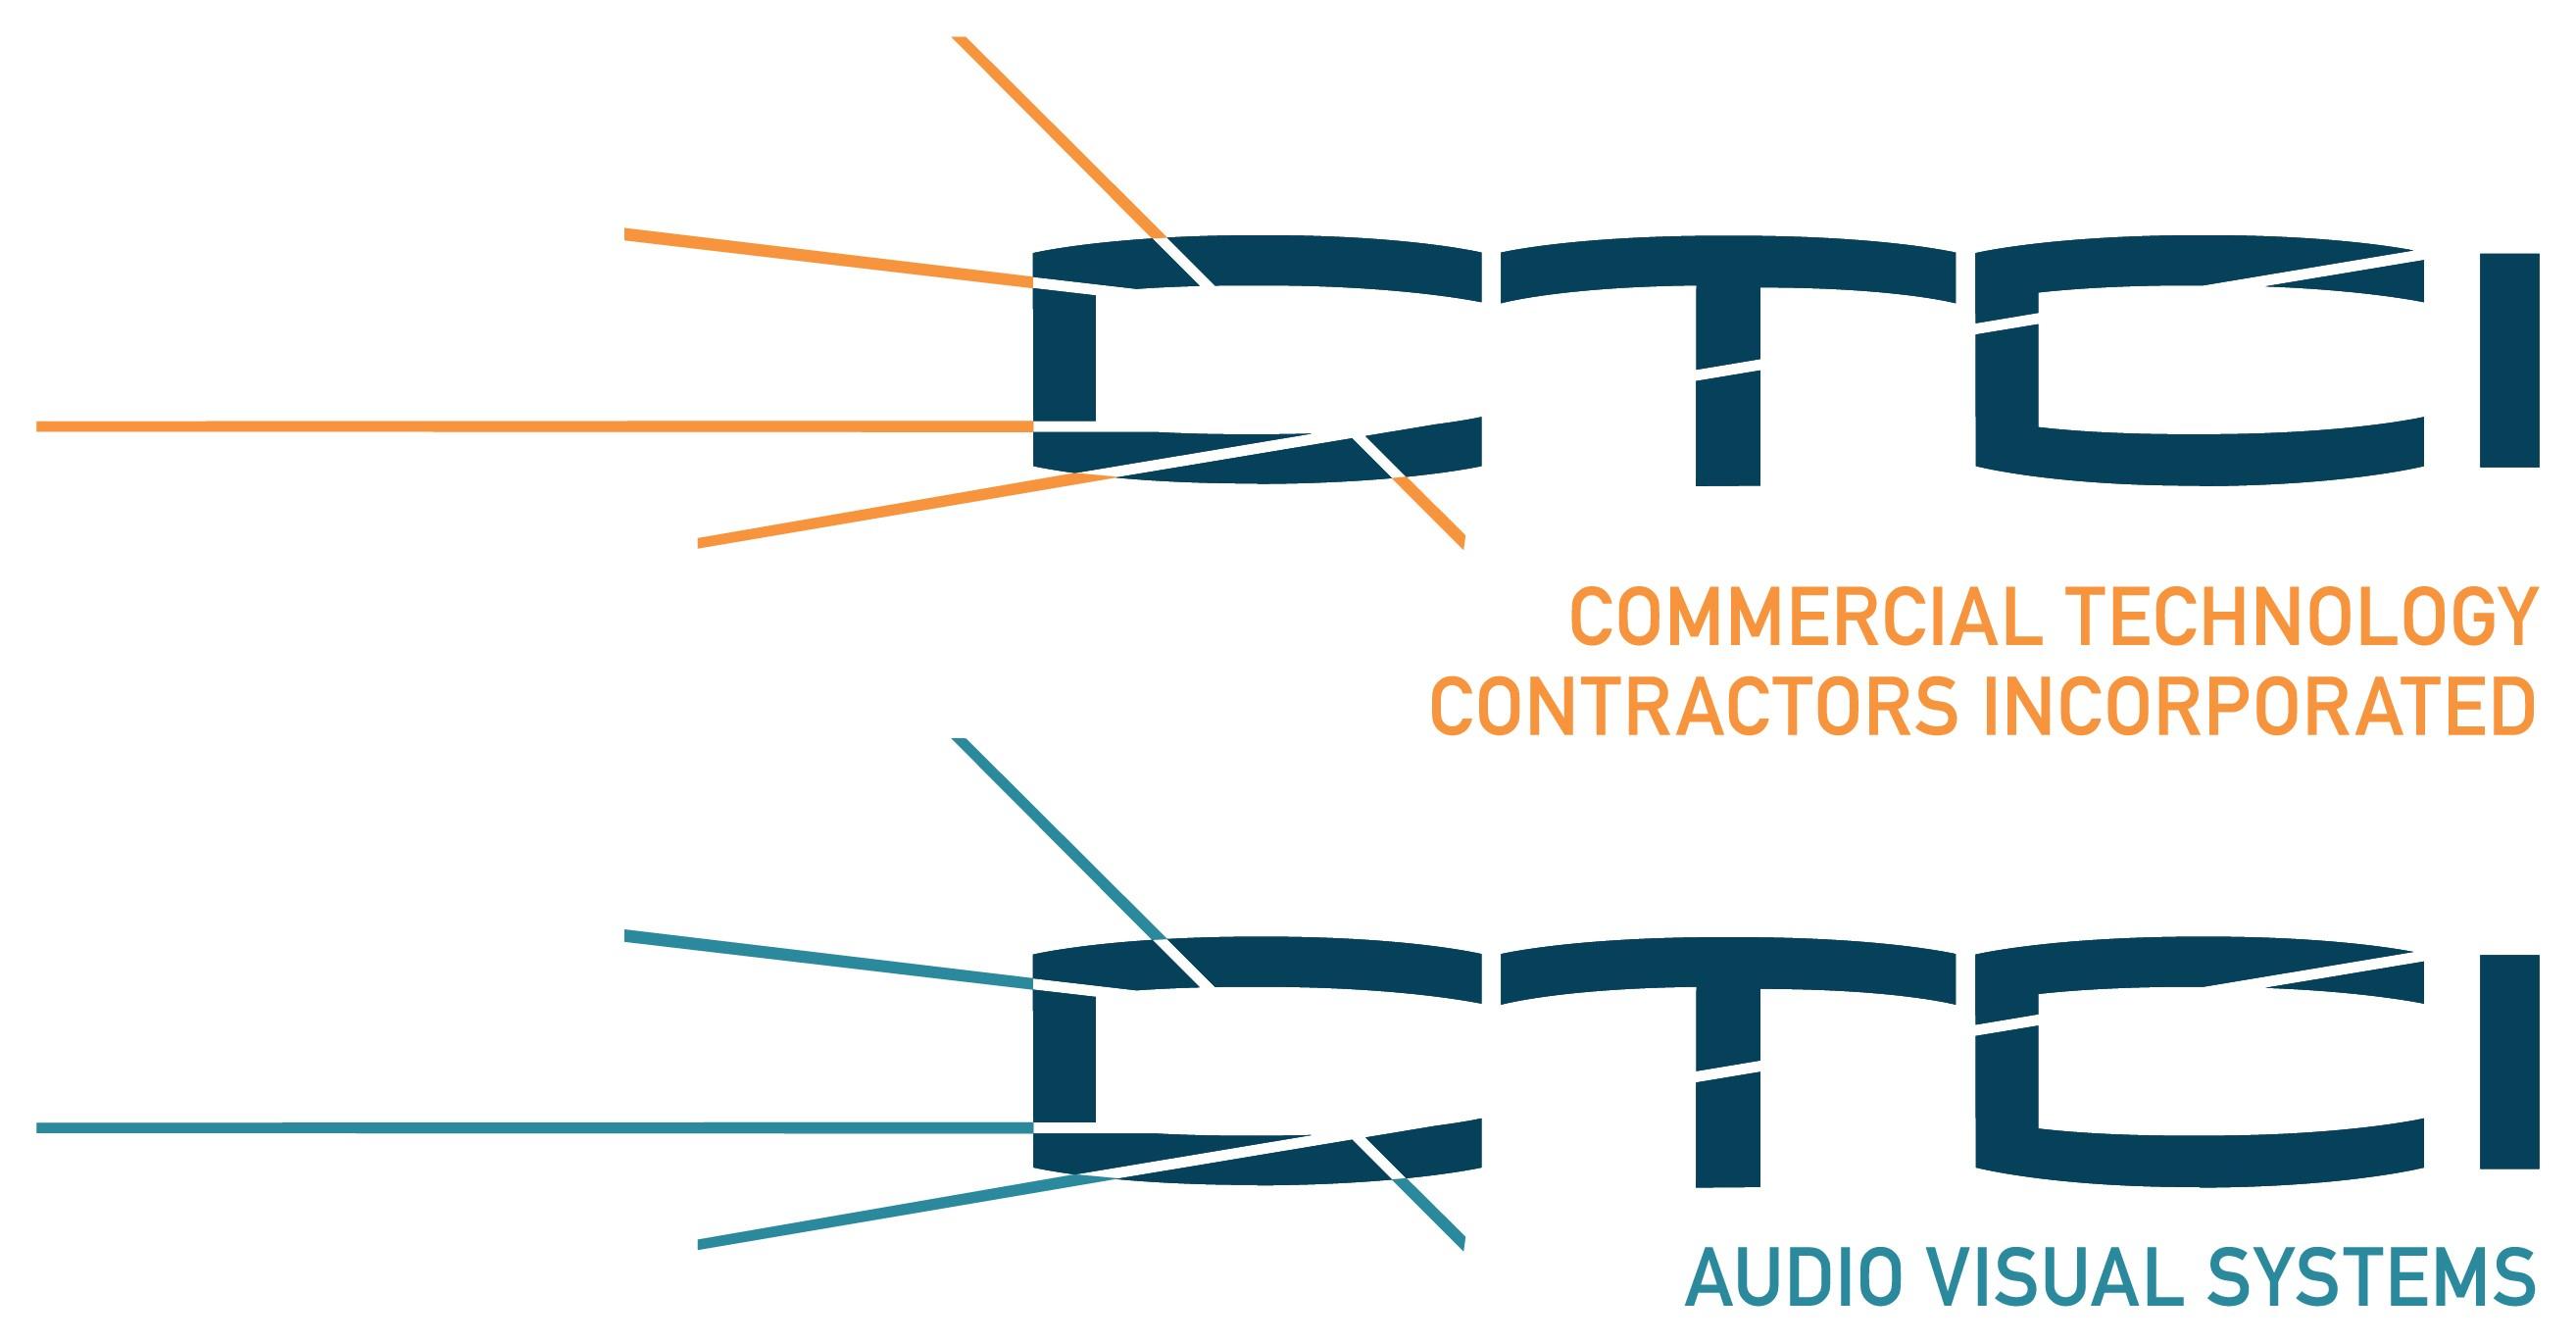 Commercial Technology Contractors Inc.'s